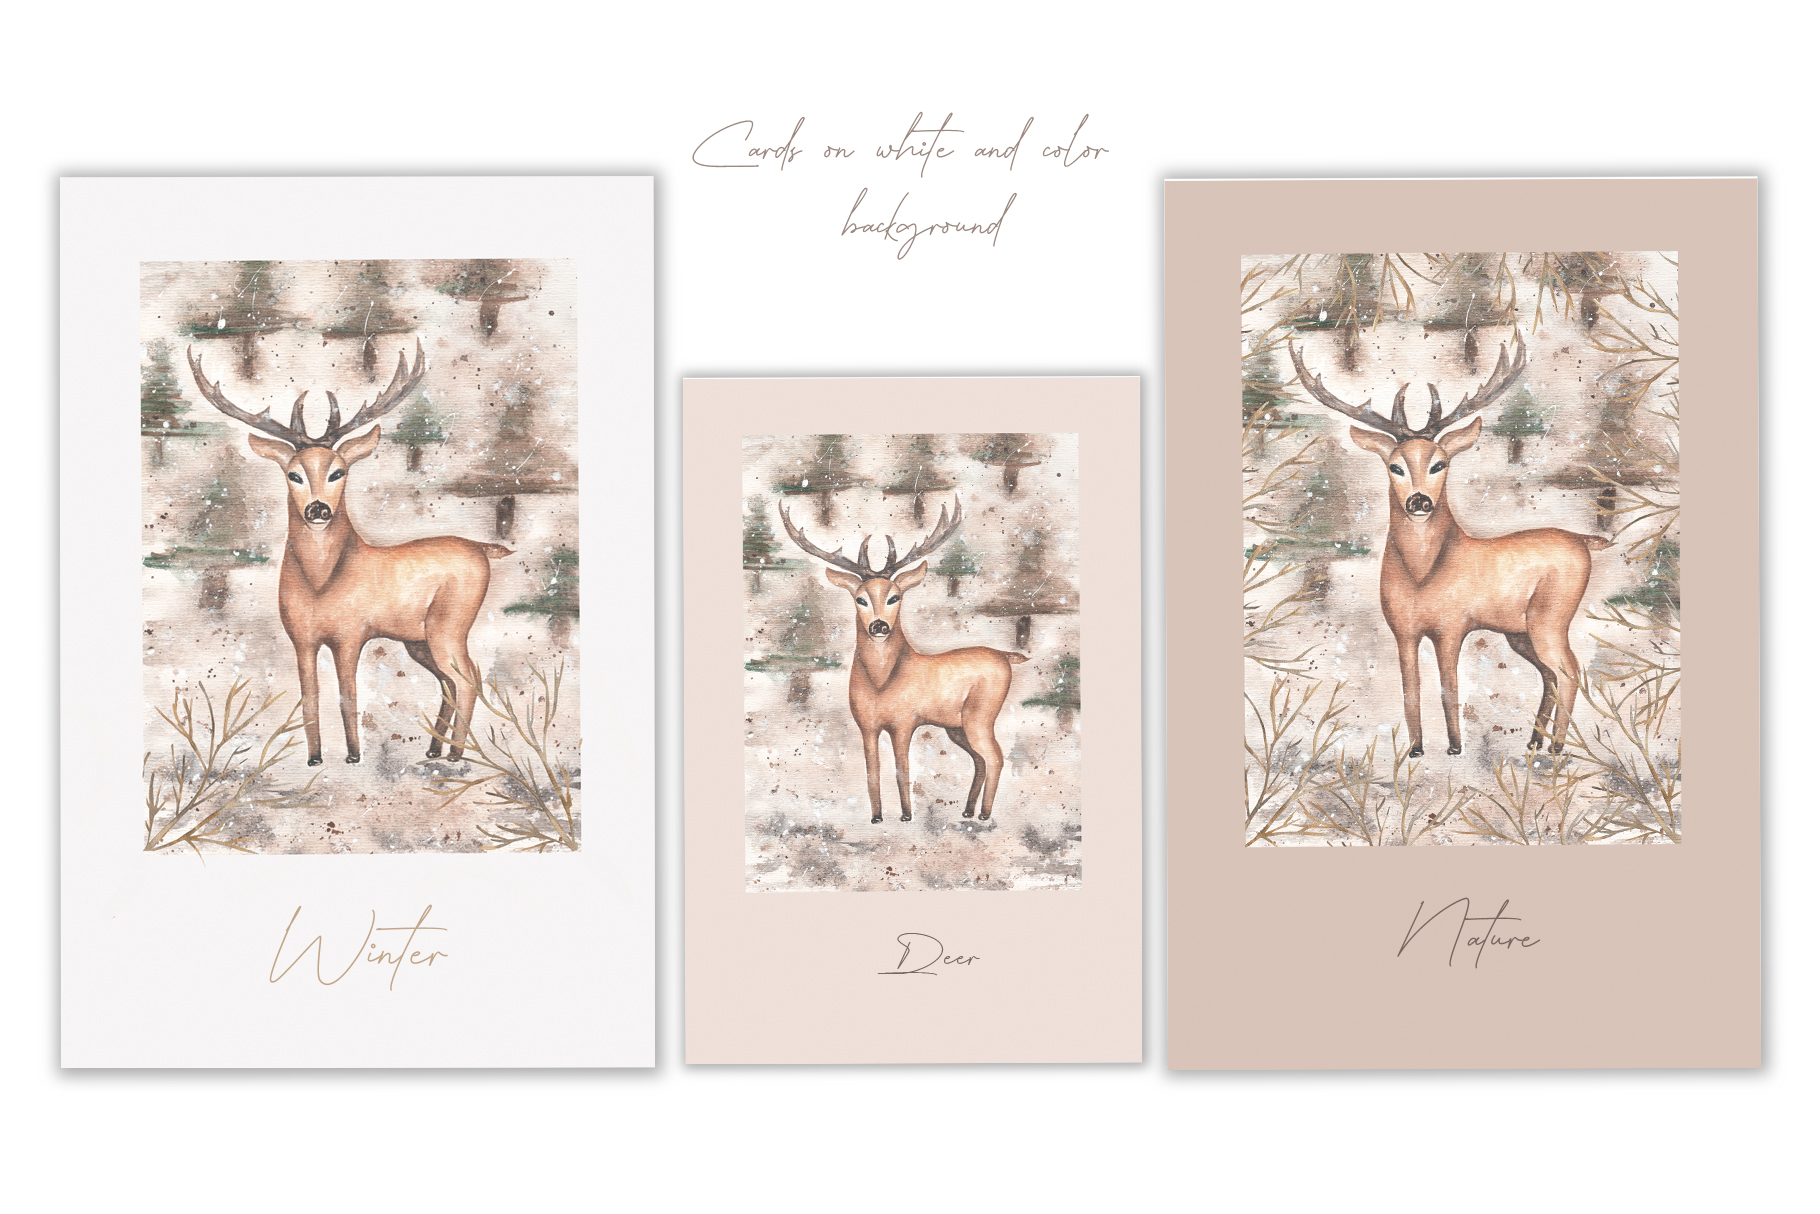 Watercolor winter deer cards example image 2